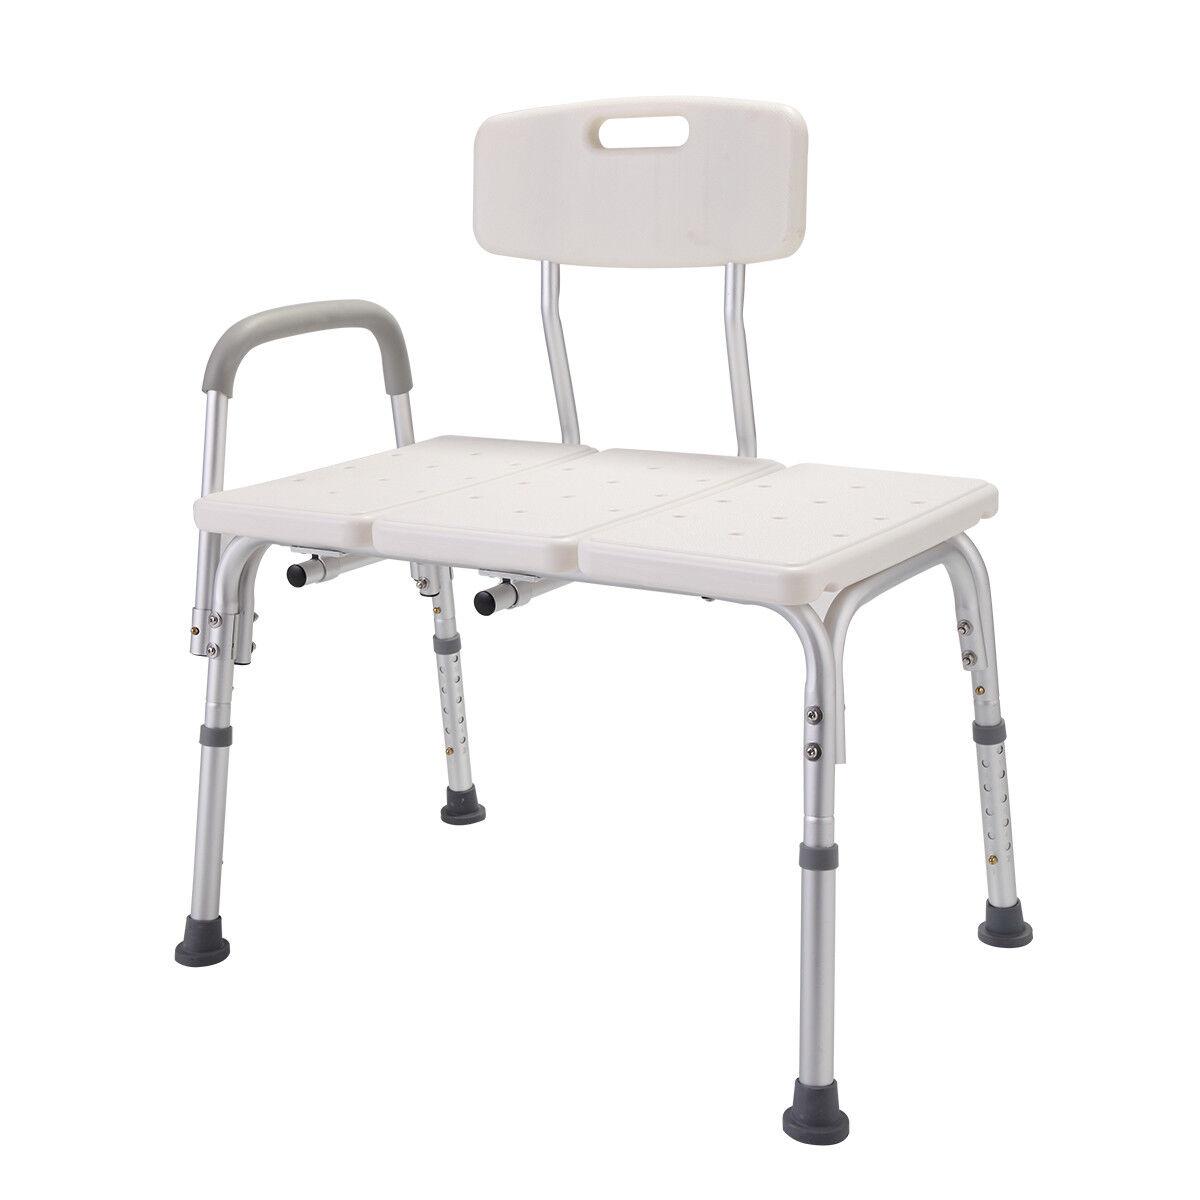 Ebay bath chair 2003 honda accord headlight replacement